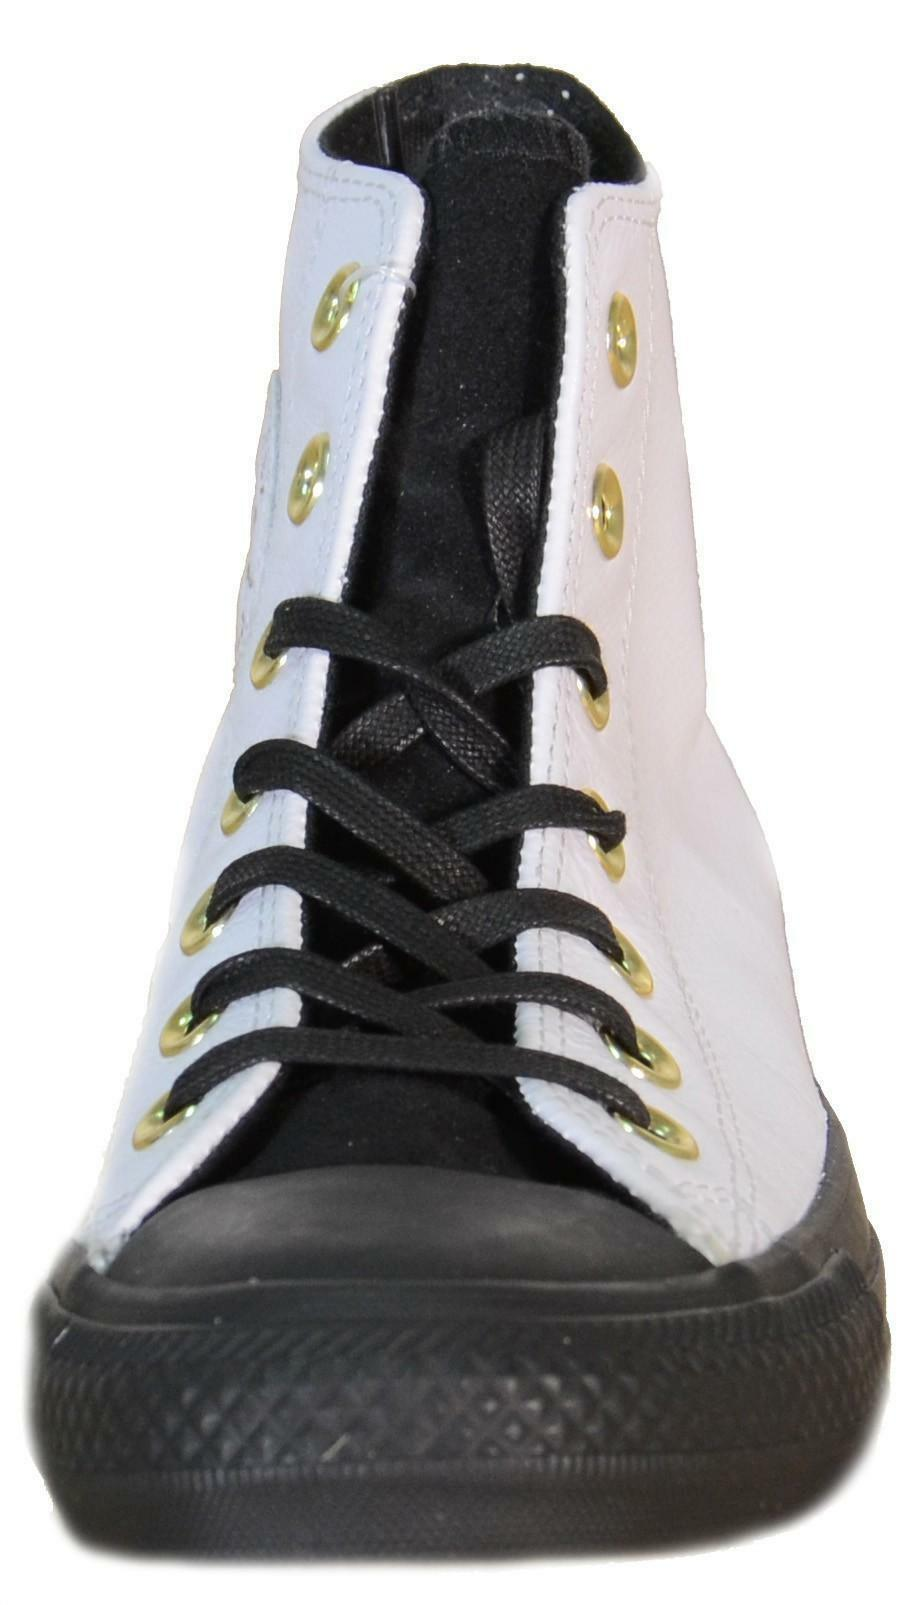 converse converse all star ct hi scarpe donna bianche pelle 146632